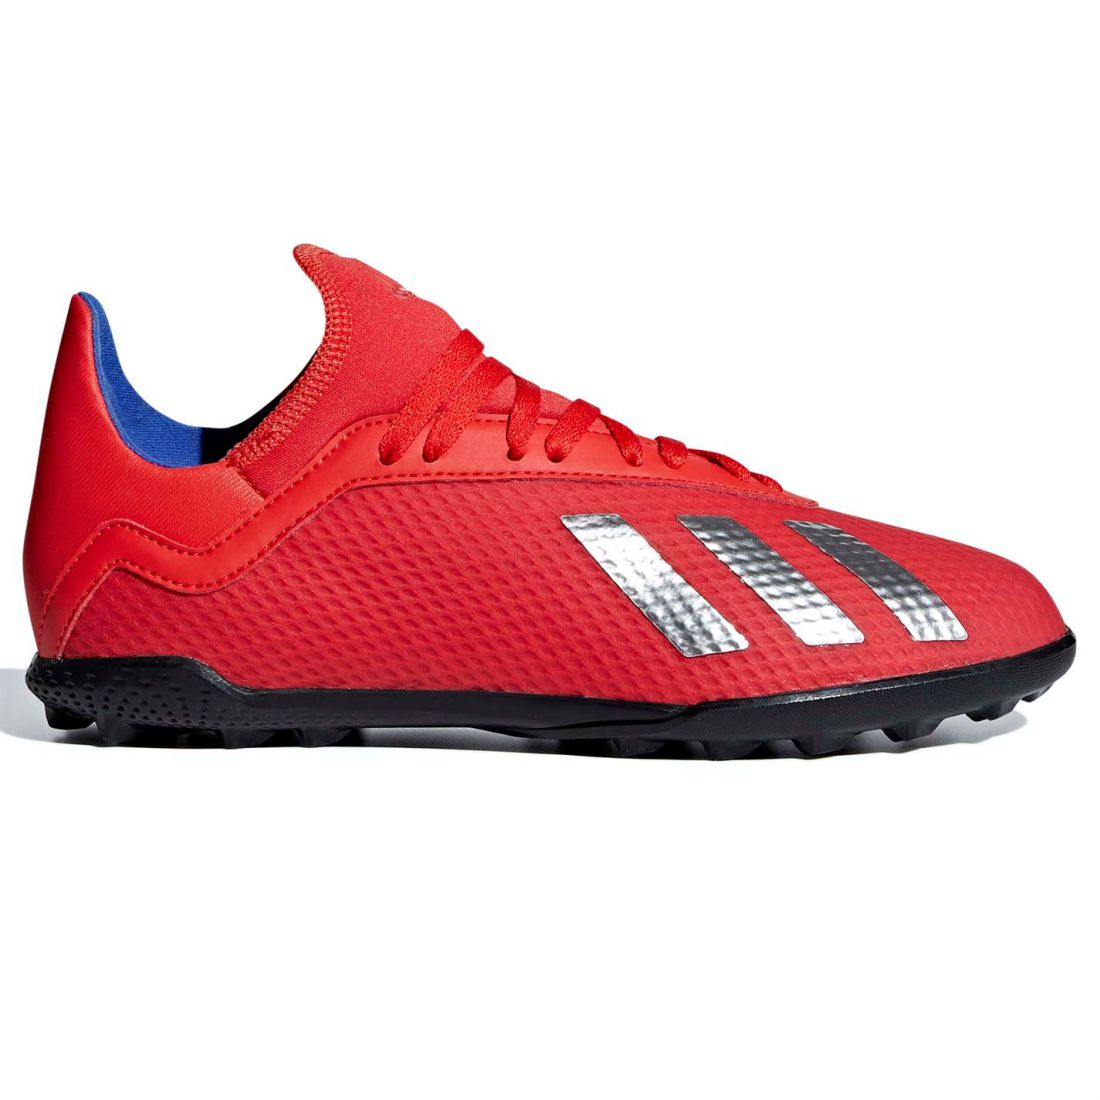 f3f184501beb adidas Kids Boys X Tango 18.3 Childs Astro Turf Football Trainers ...